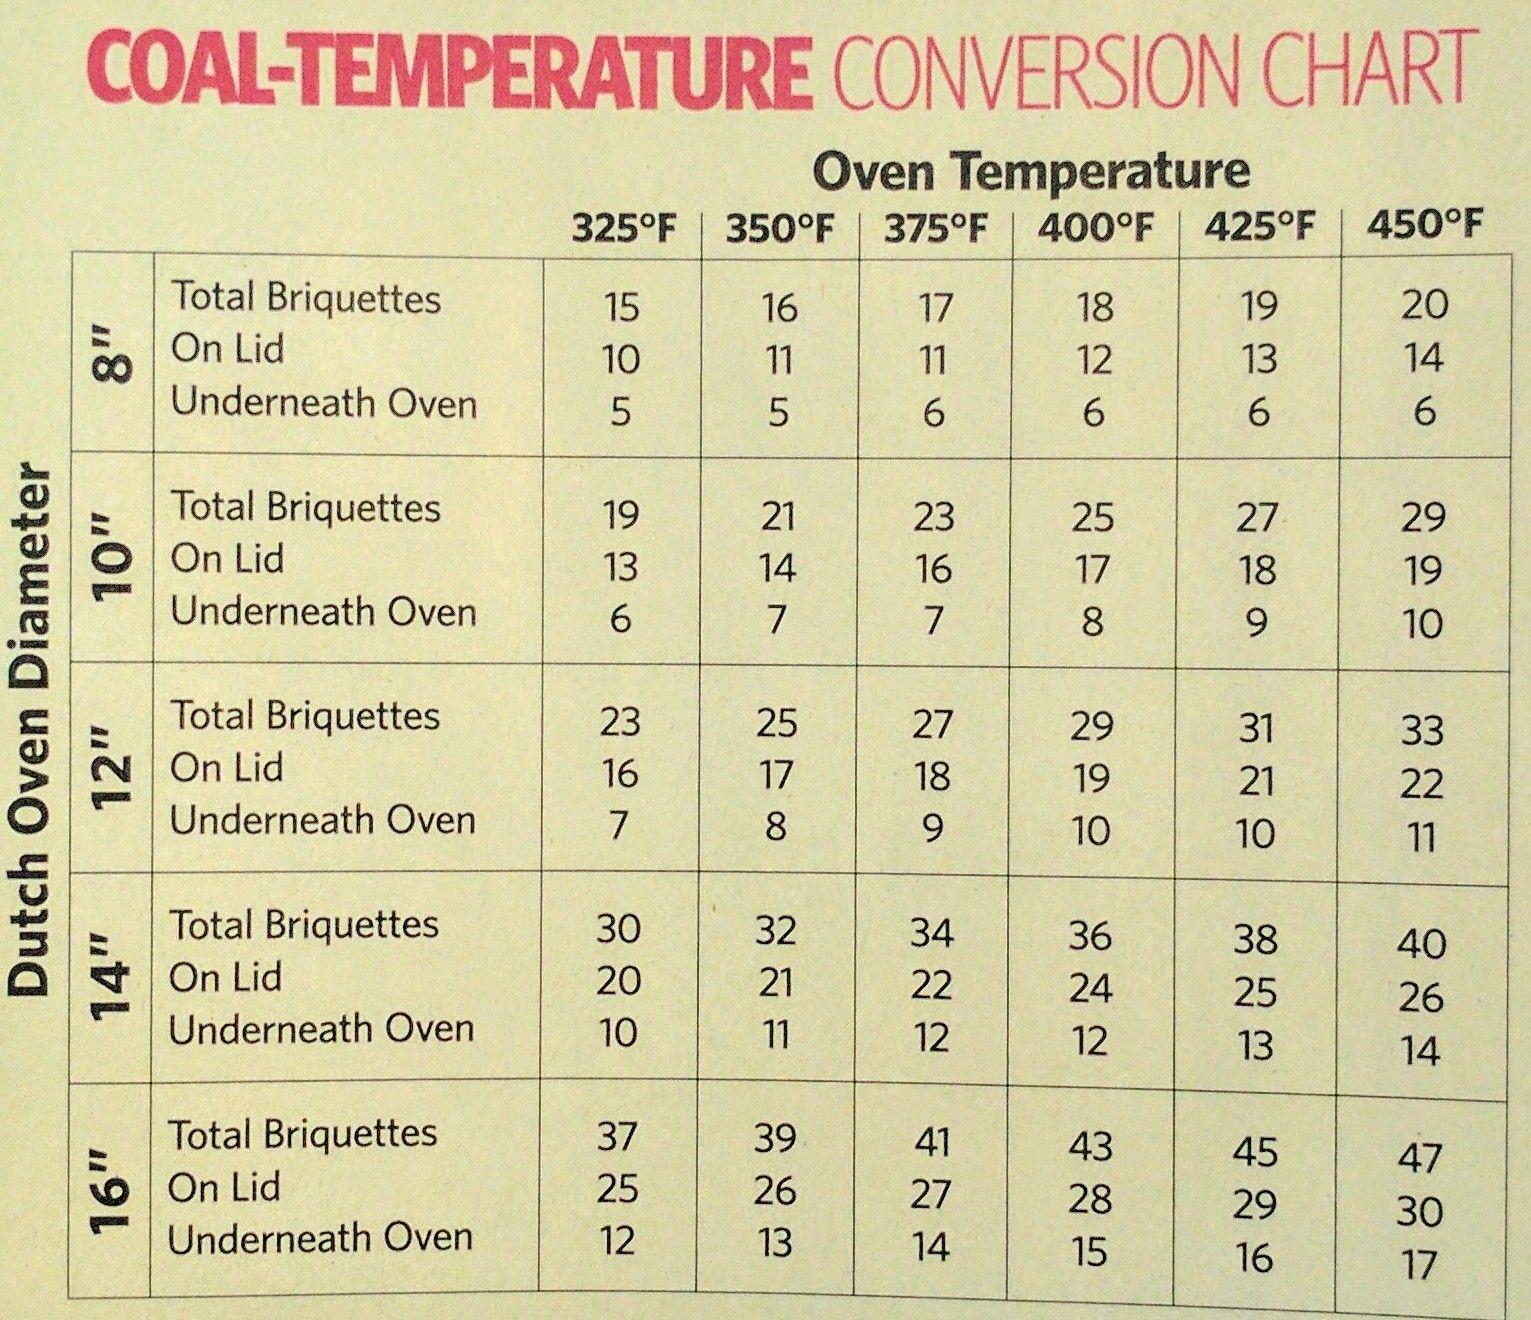 Dutch Oven Coal Temperature Conversion Chart Dutch Oven Cooking Dutch Oven Camping Recipes Dutch Oven Desserts